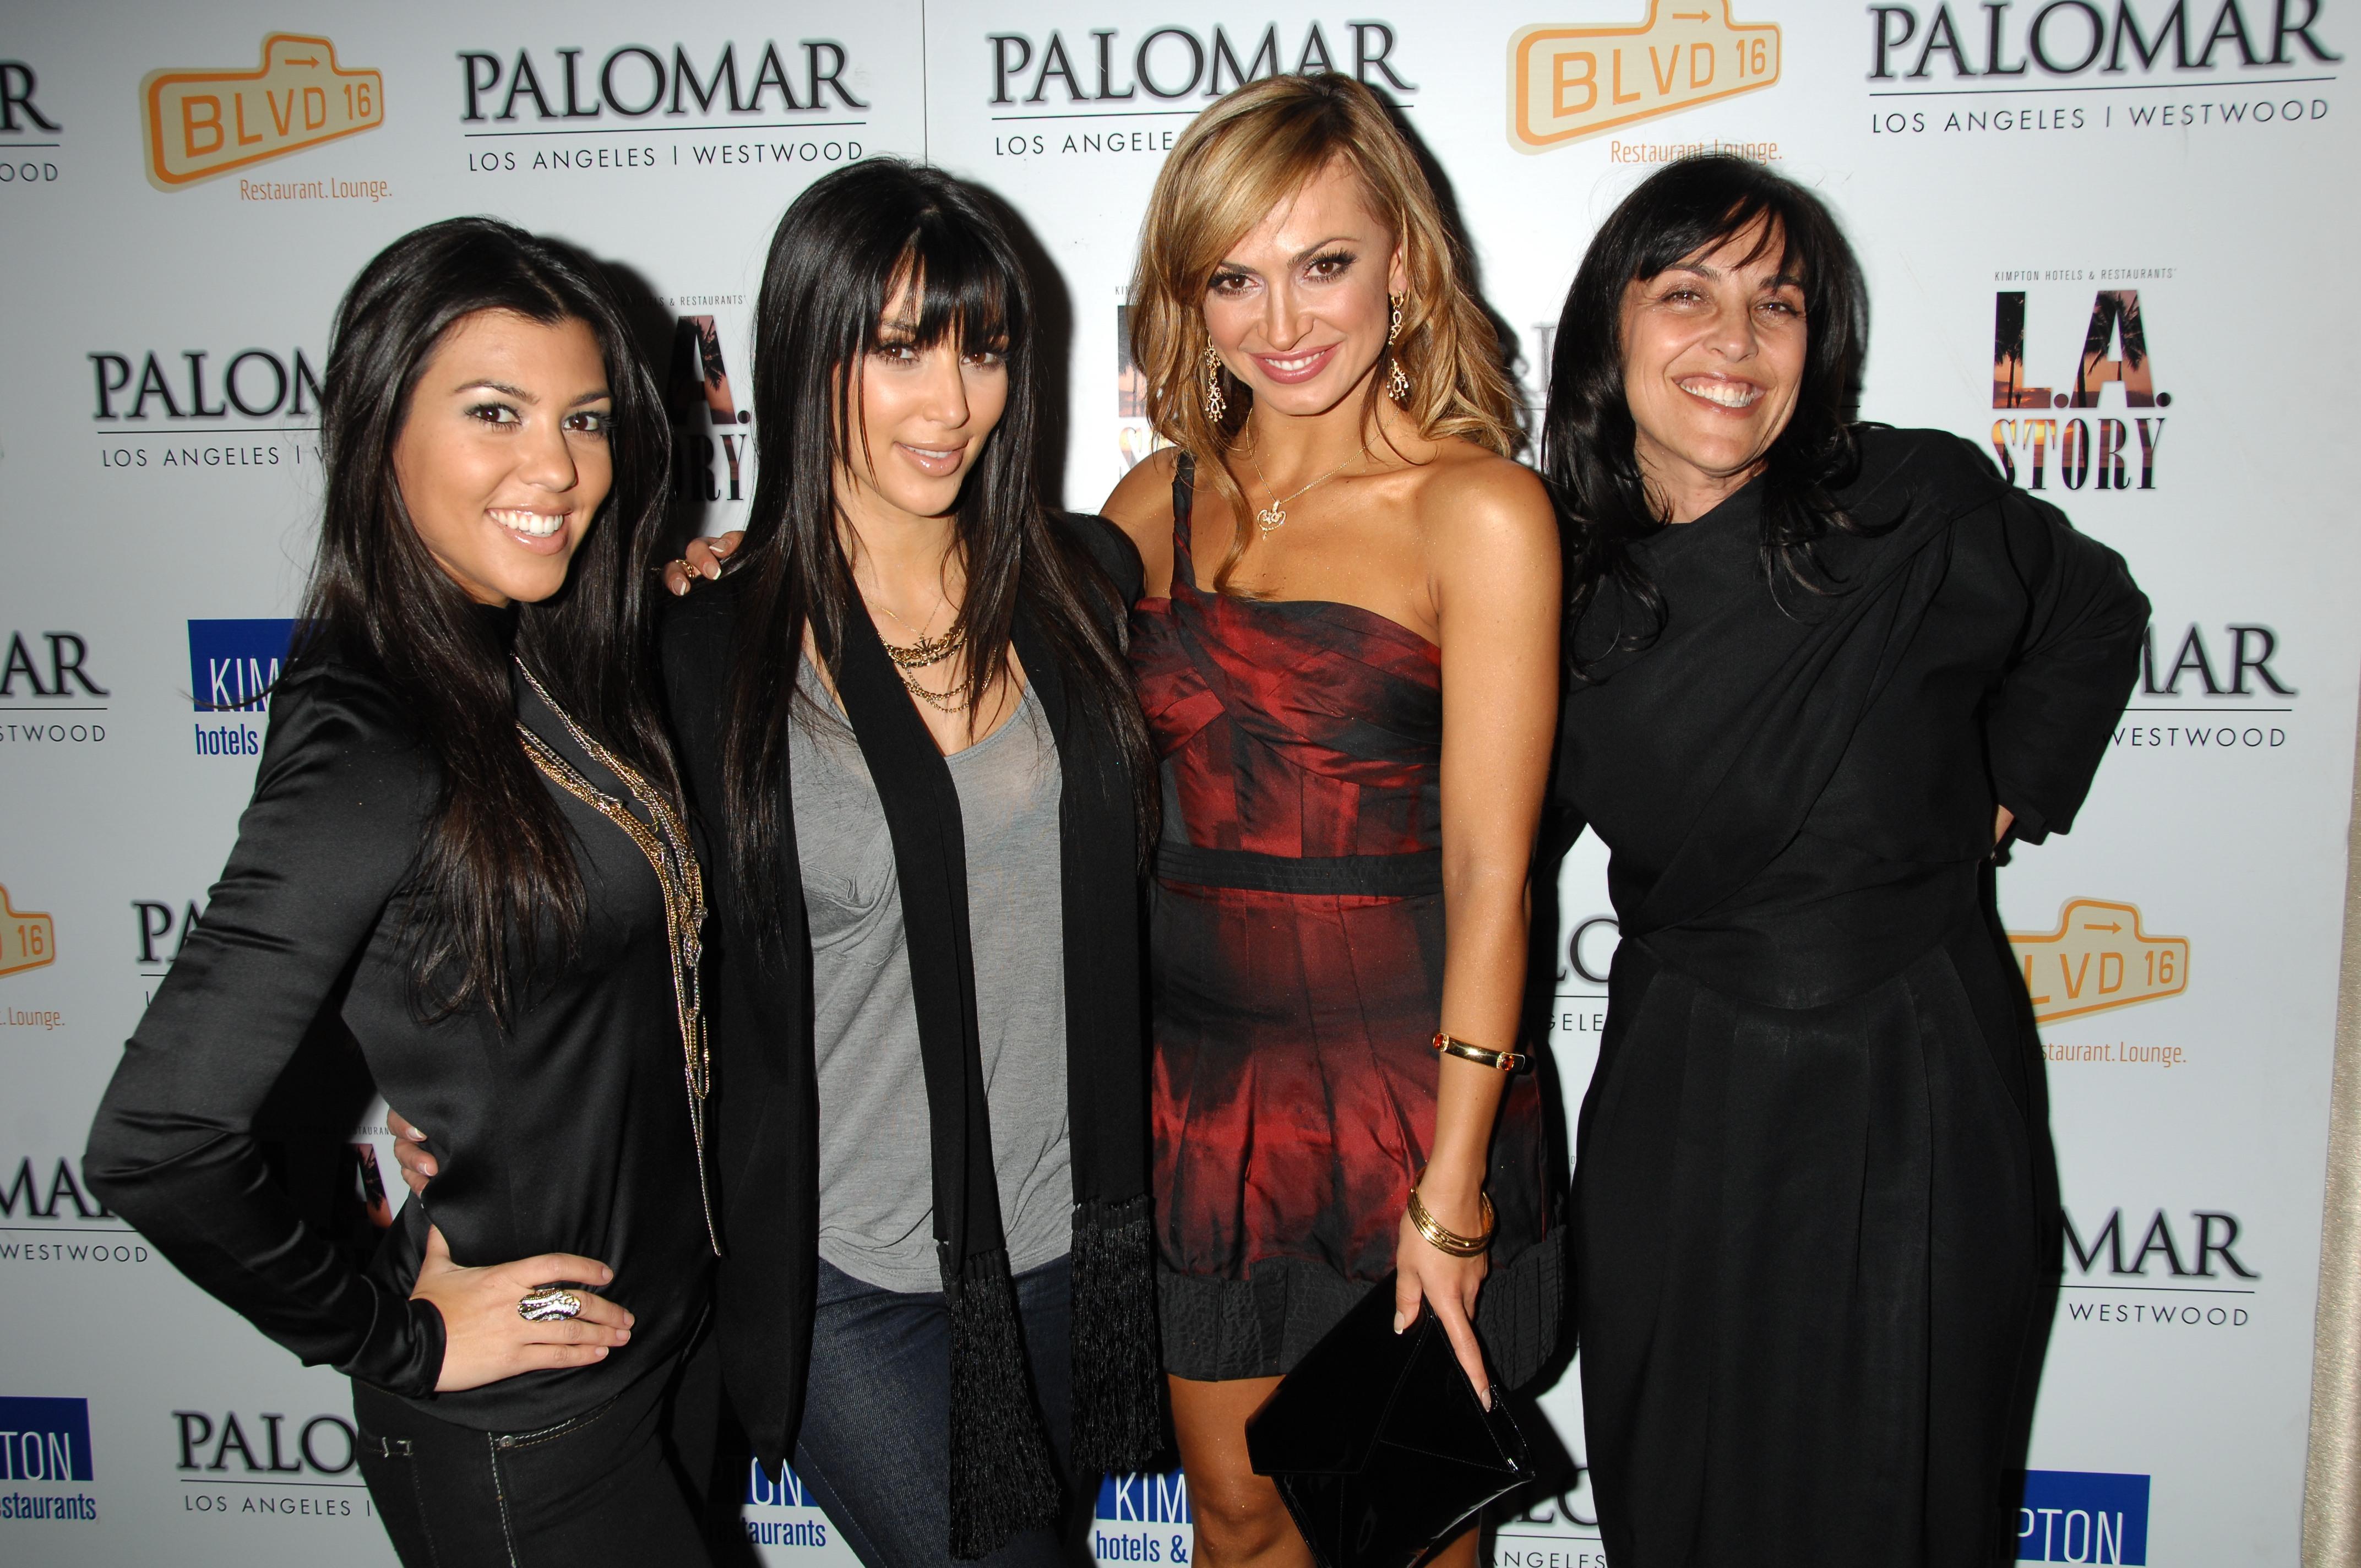 03447_Kim_Kardashian_2008-12-08_-_A_Night_For_Change_benefiting_Alternative_Intervention_Models_in_LA_8128_122_552lo.jpg